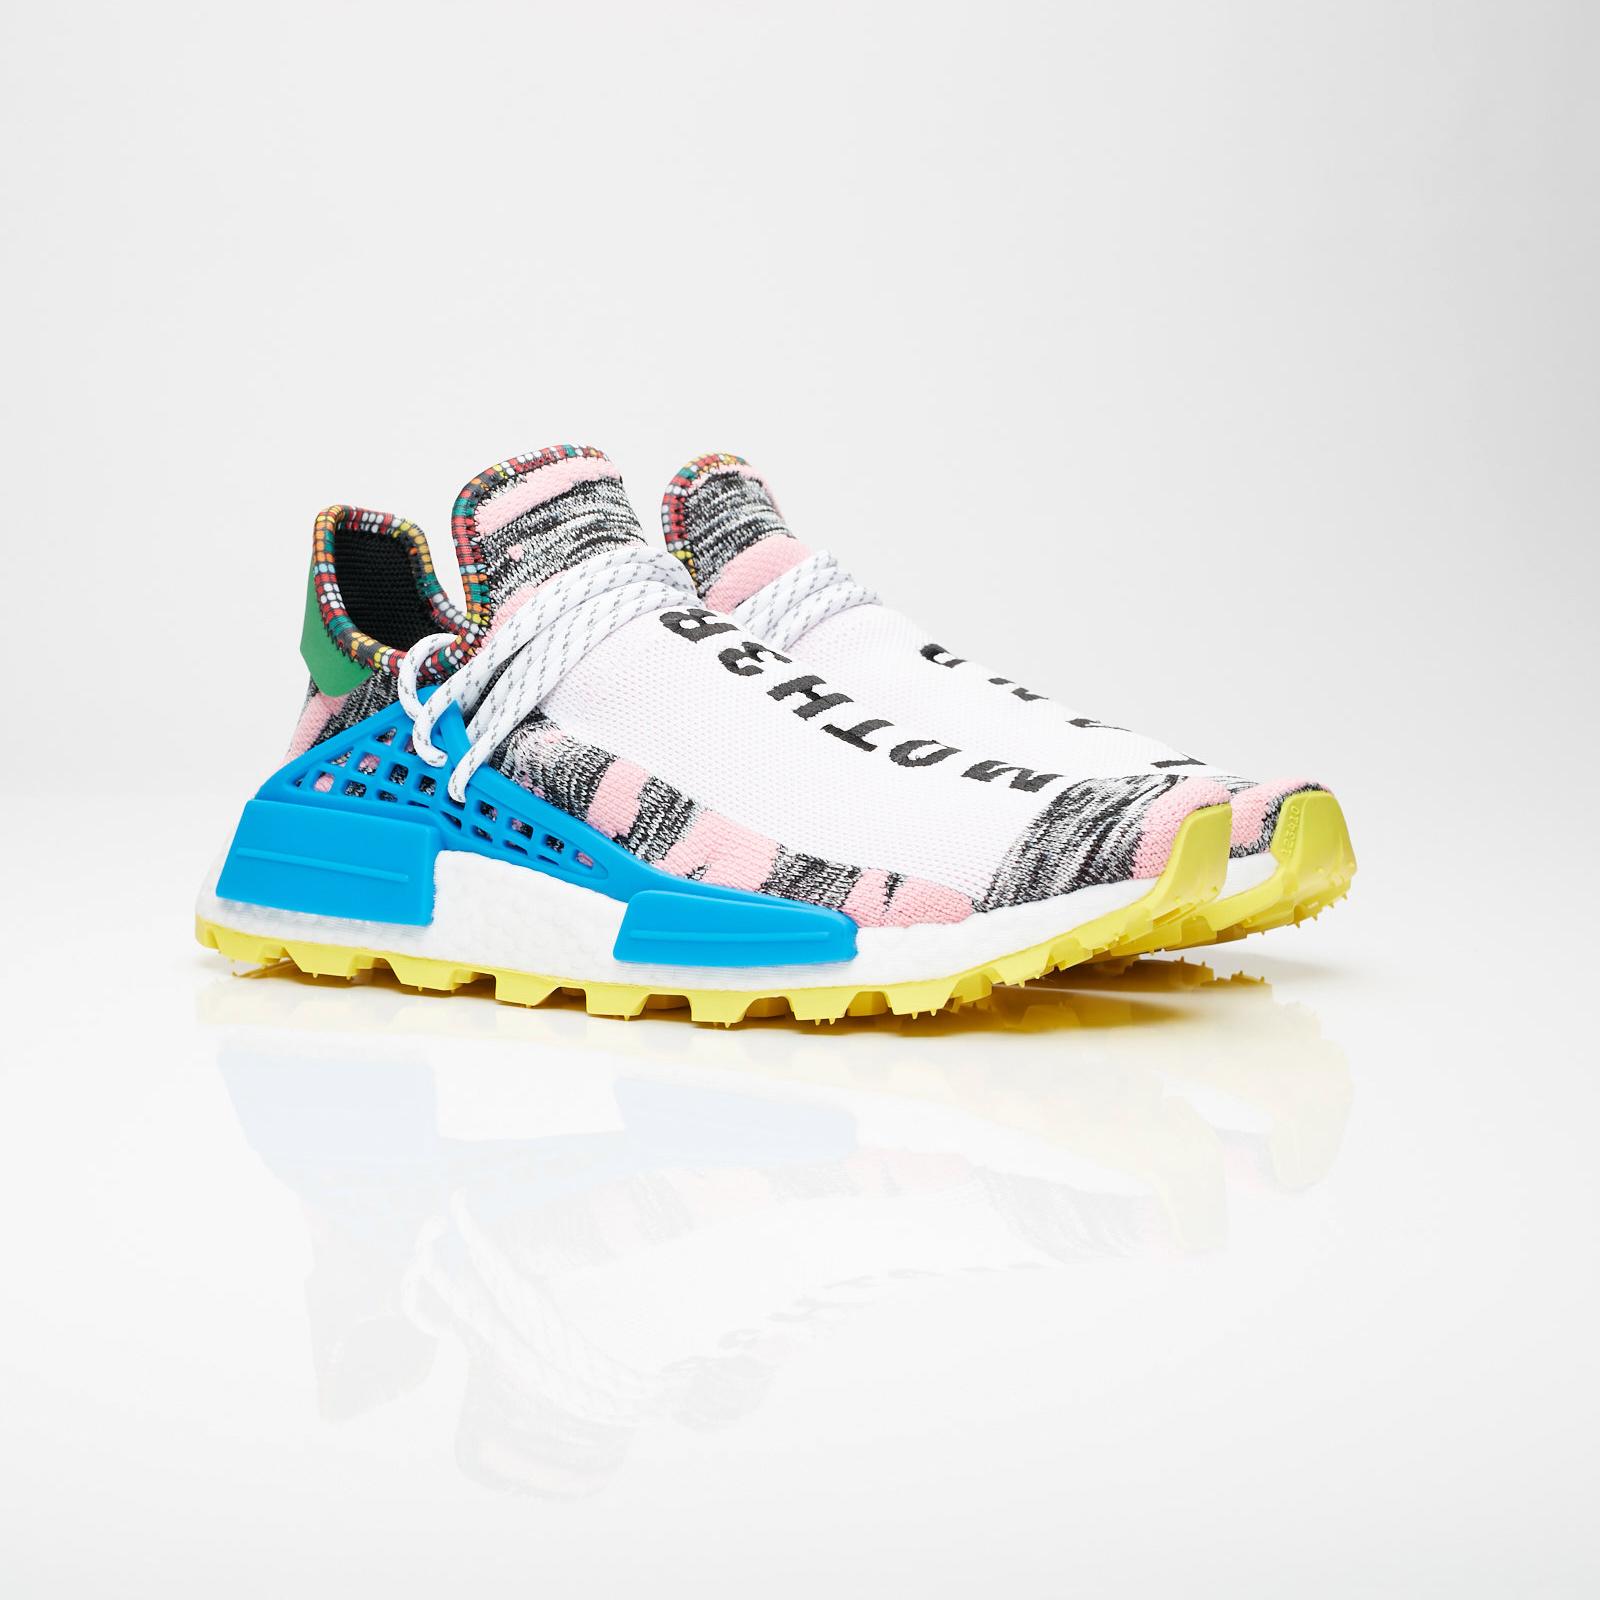 adidas Solar HU NMD x Pharrell Williams